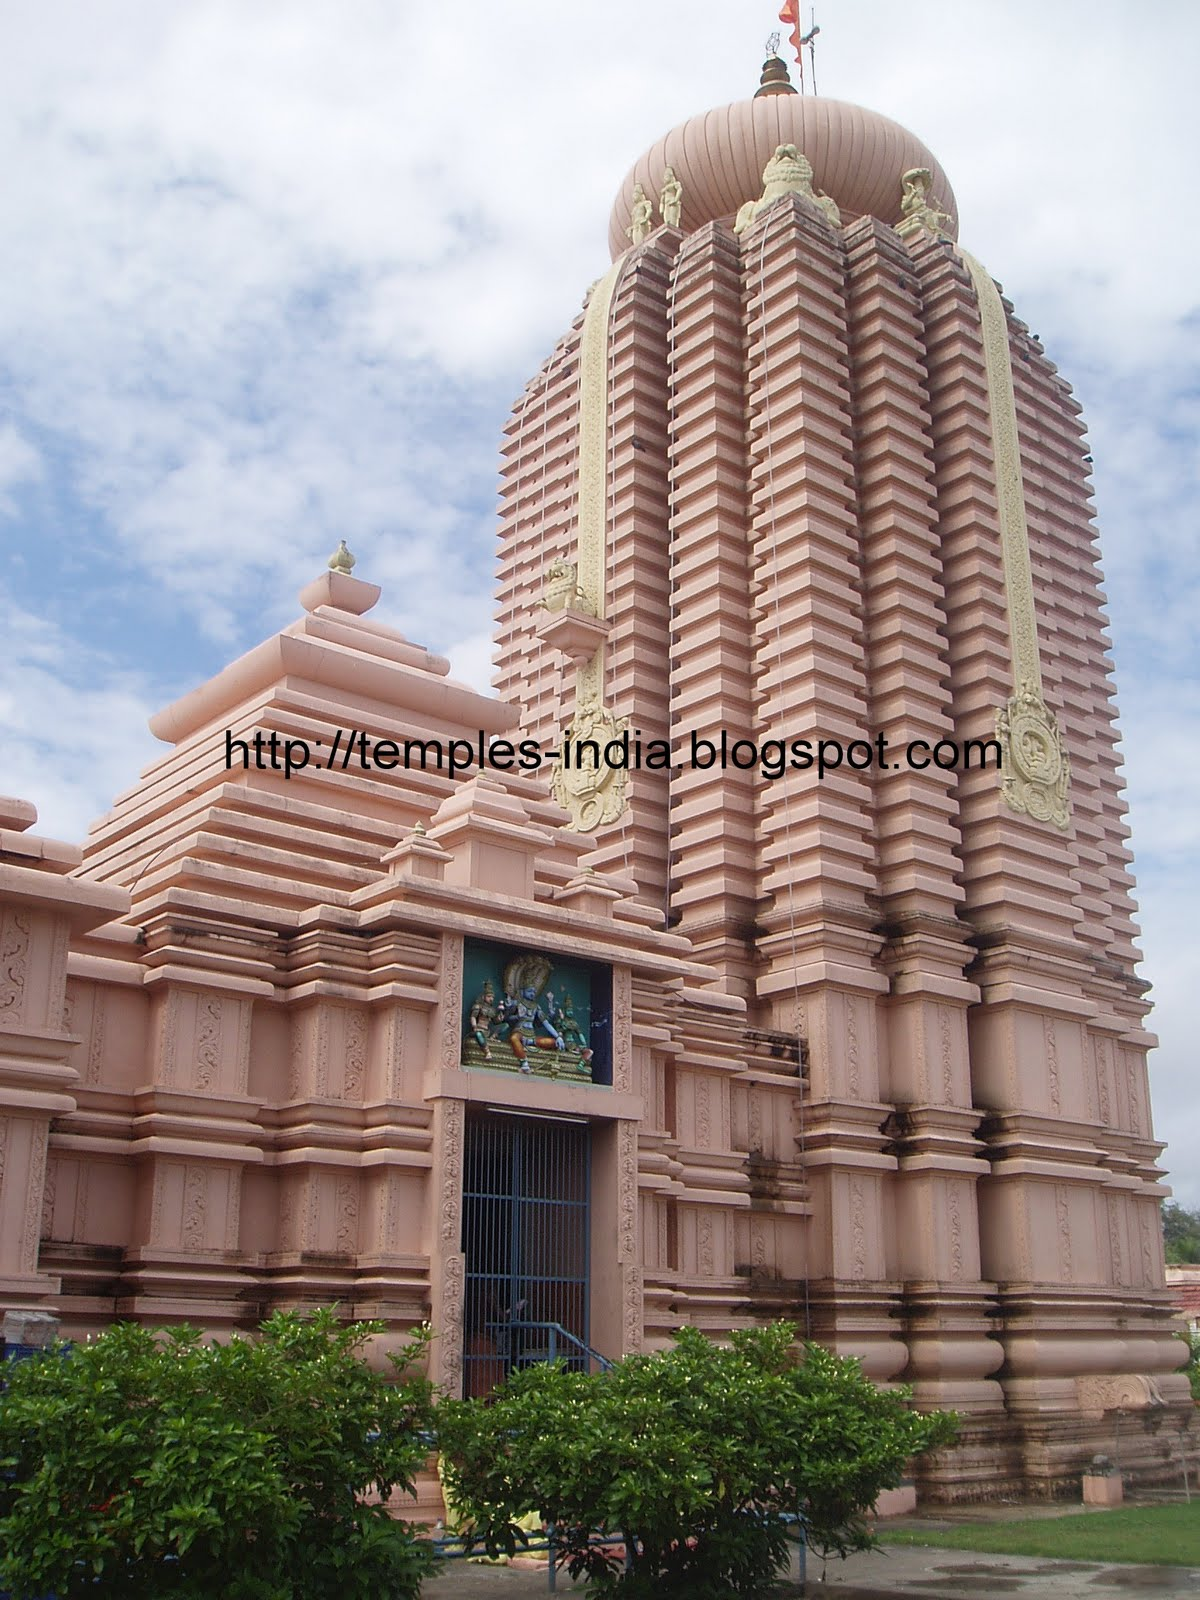 Temples of India: Pandurangan Temple, Tennangur